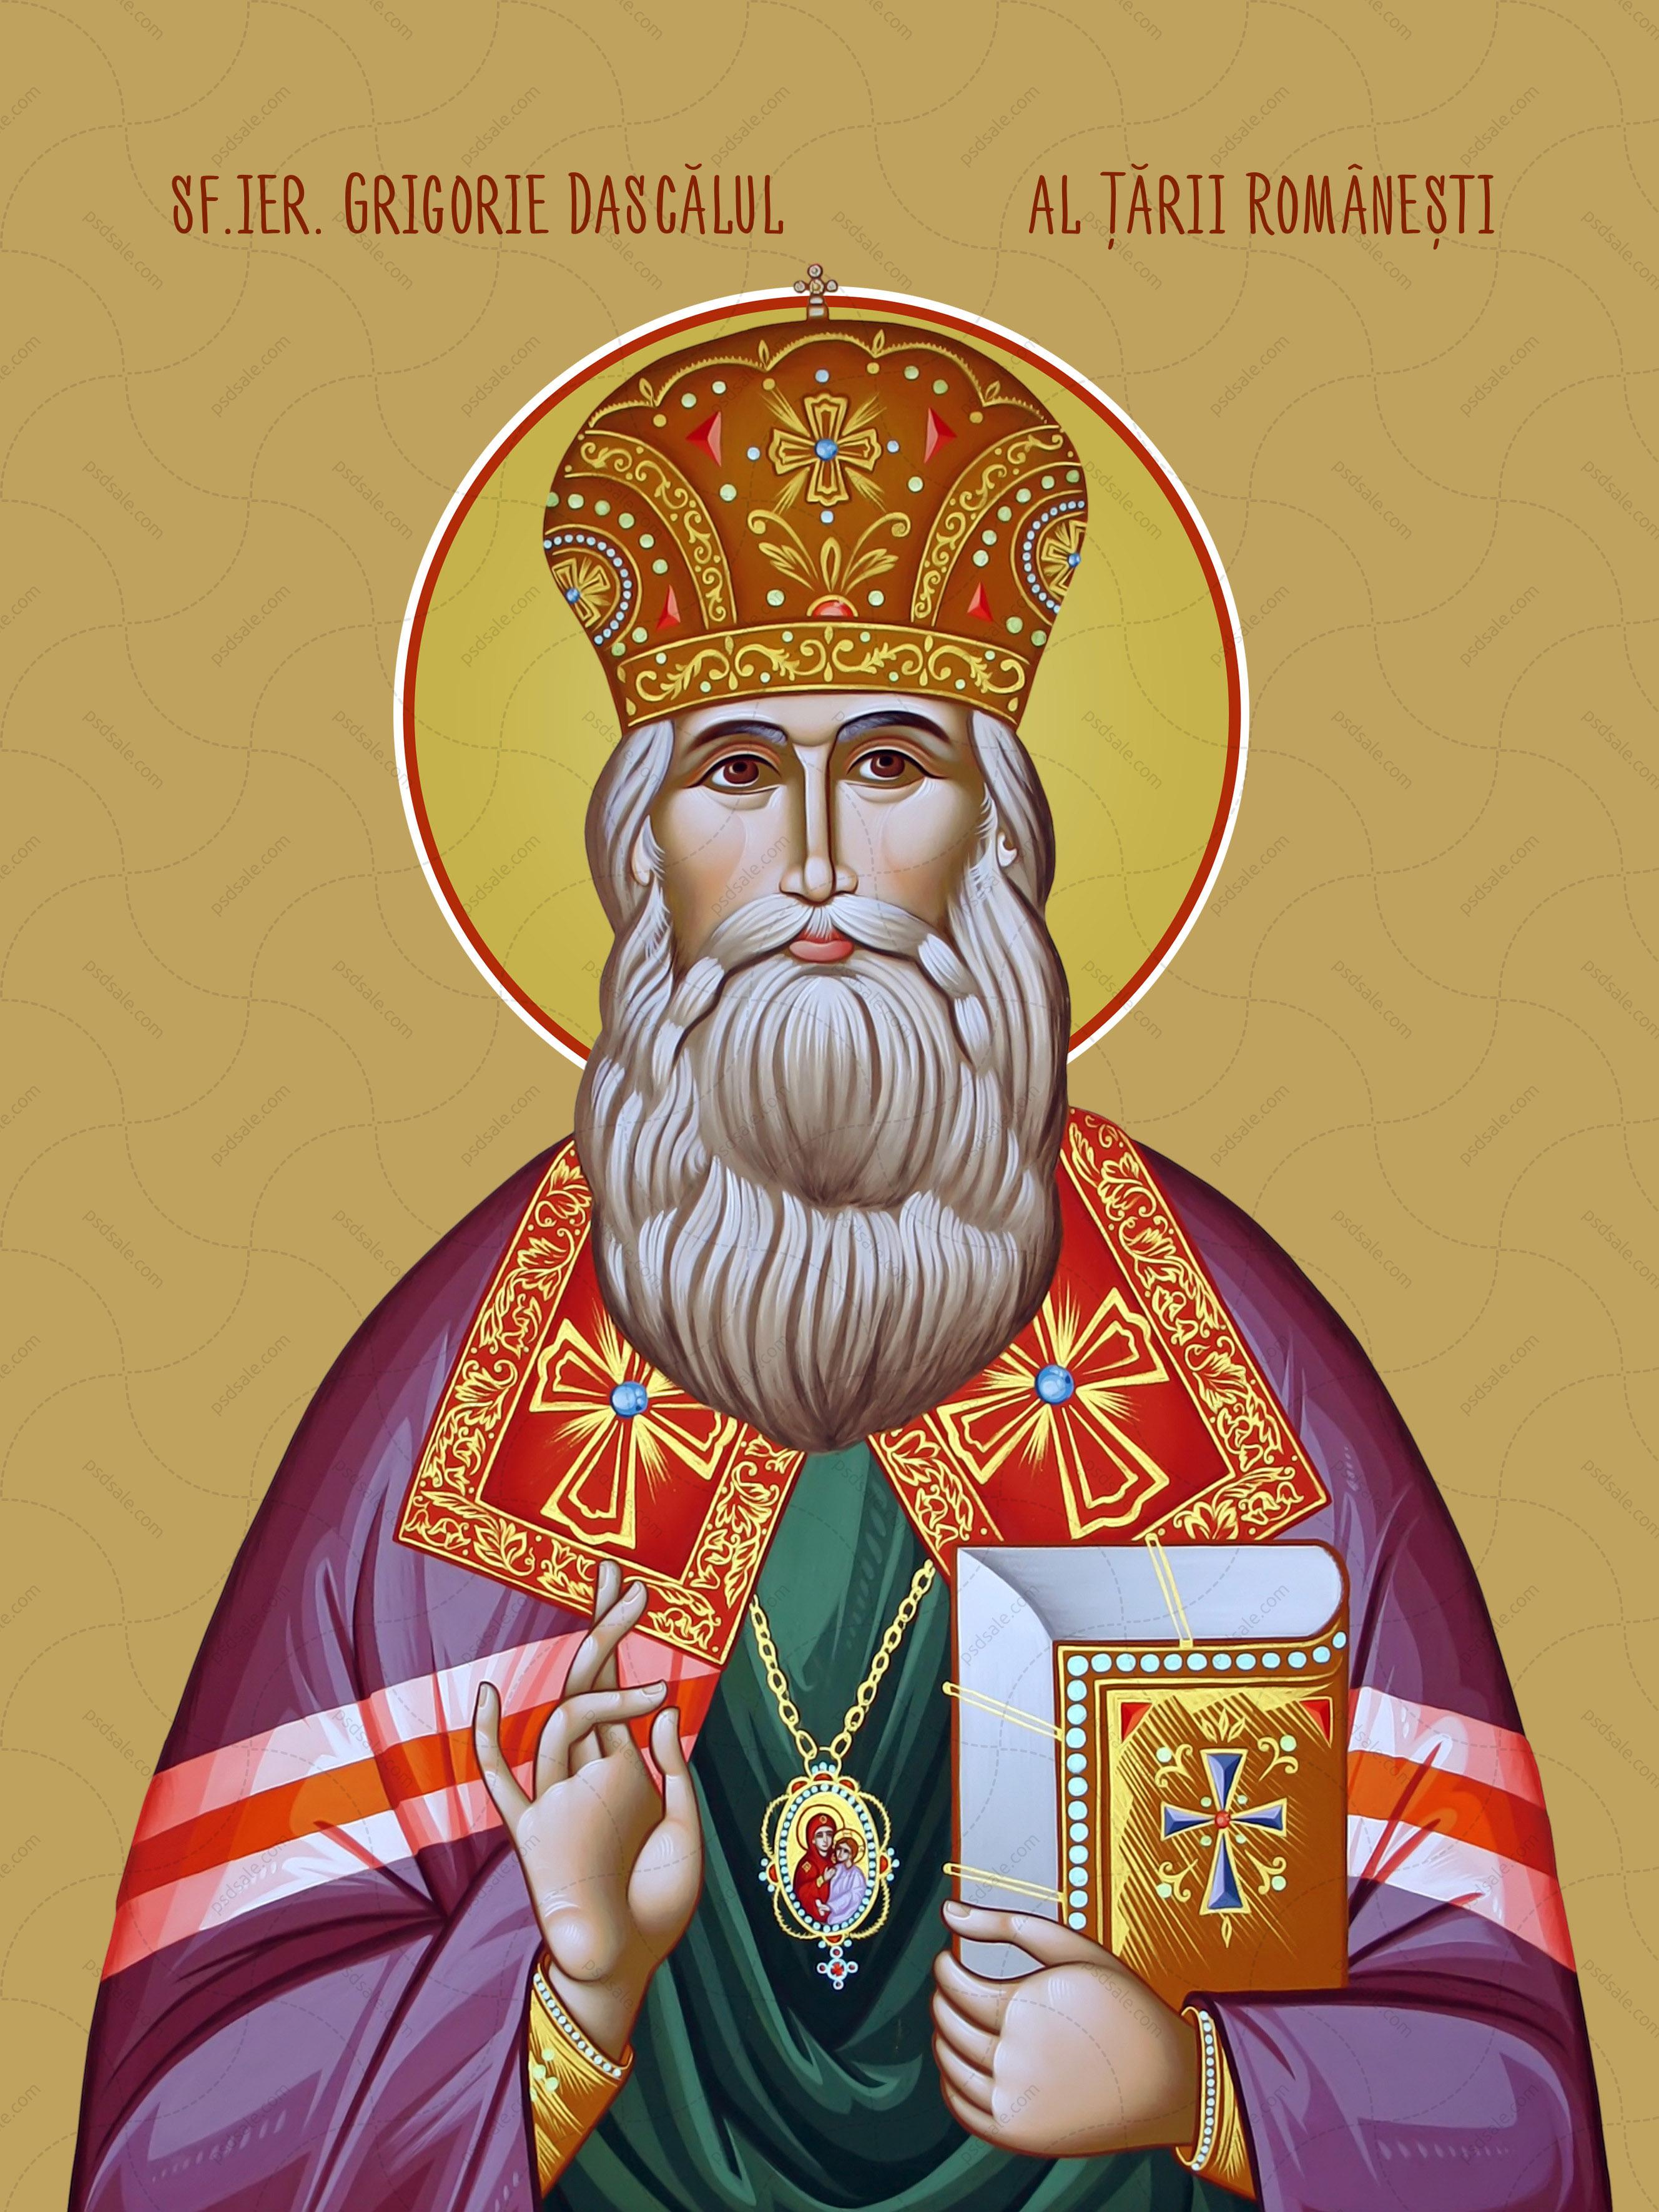 Григорий Валашский / Sf.Grigorie Dascălul